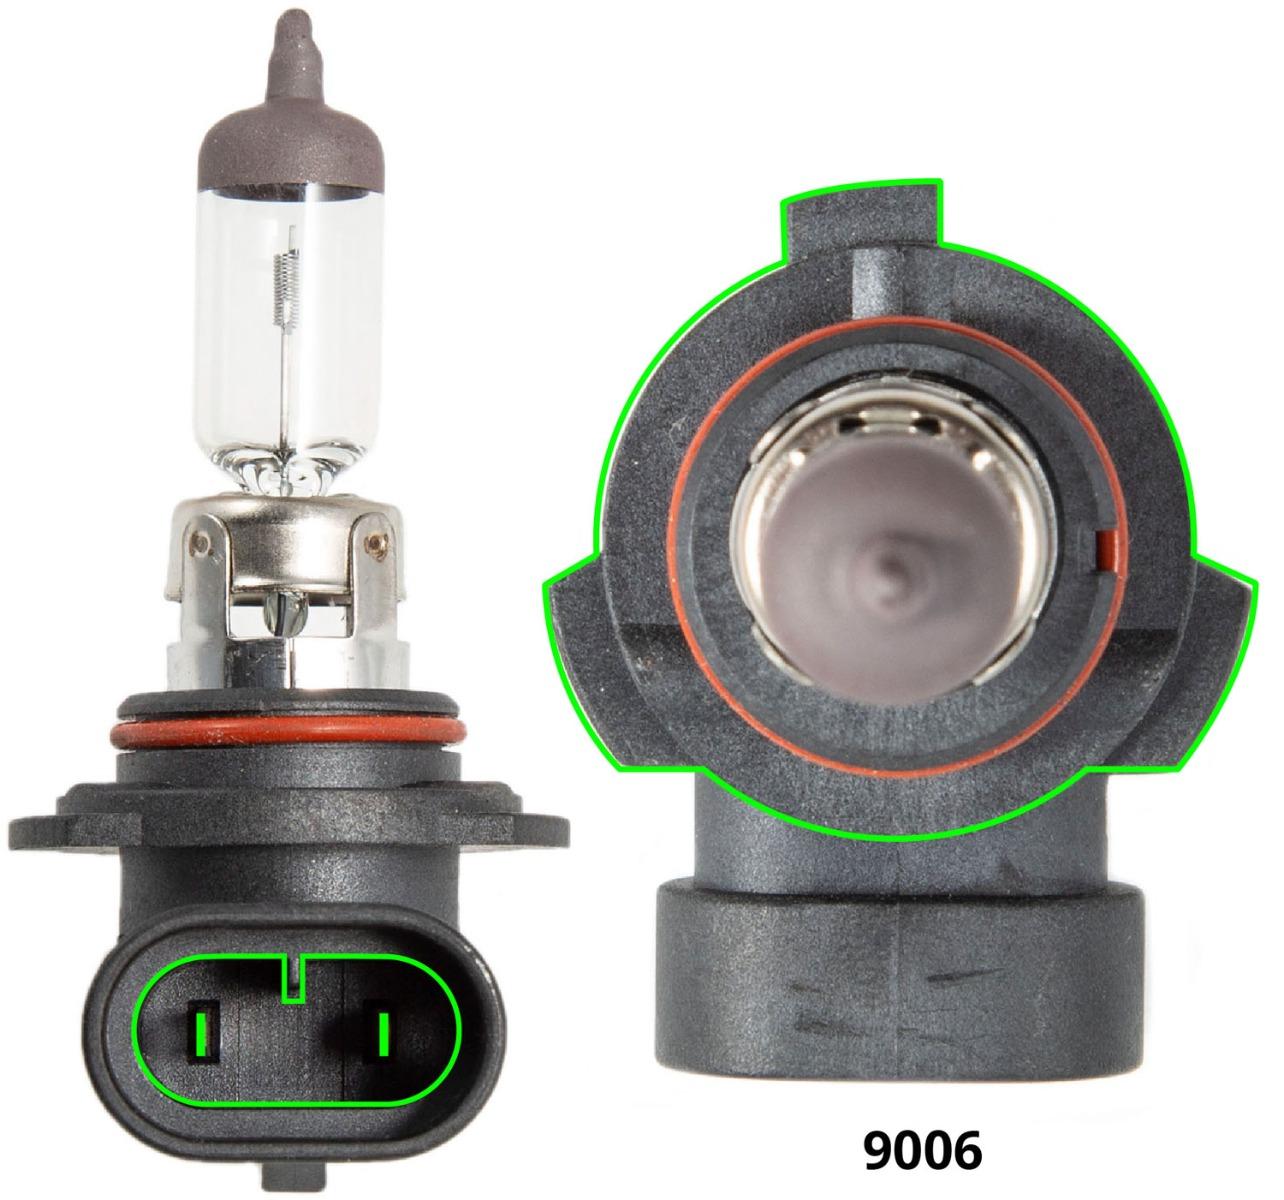 hight resolution of 9006 stock bulb